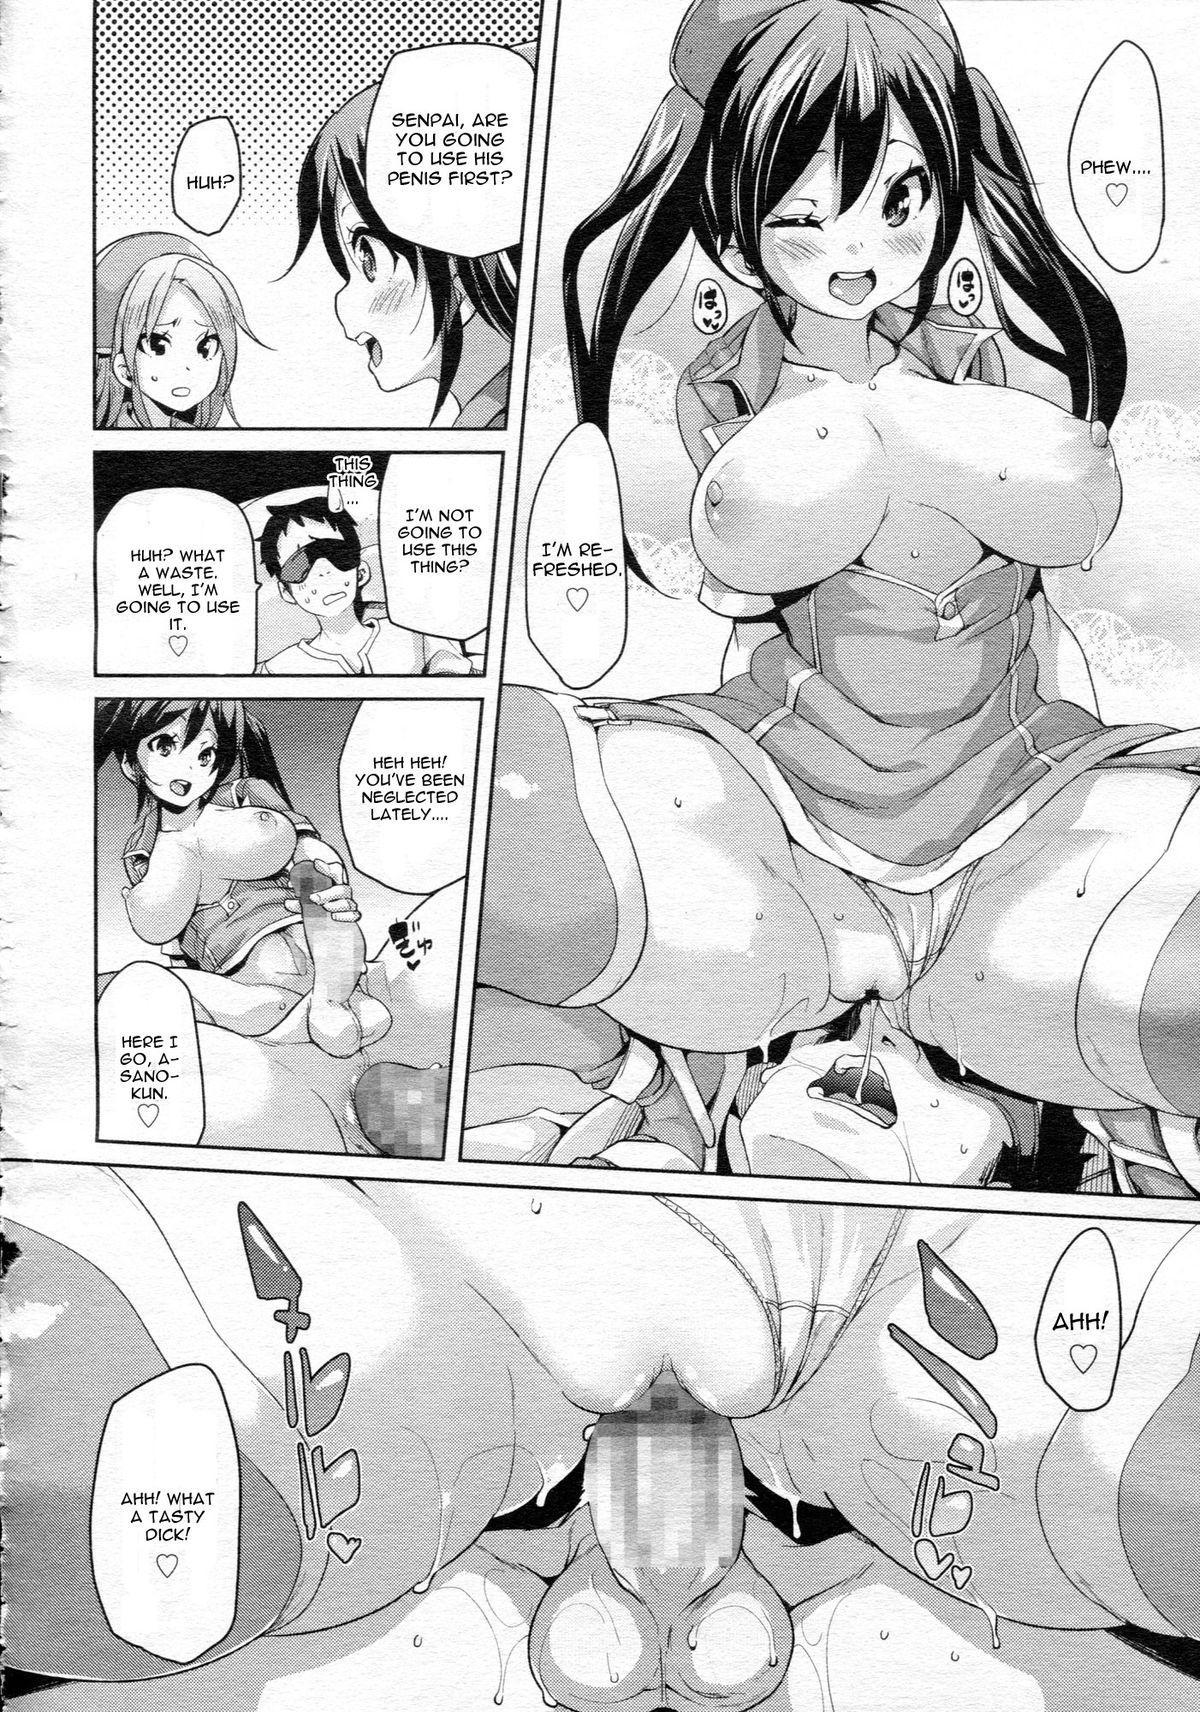 Iryouyou nara Daijoubu   If It's For Medical Use, Then It's Okay! 17